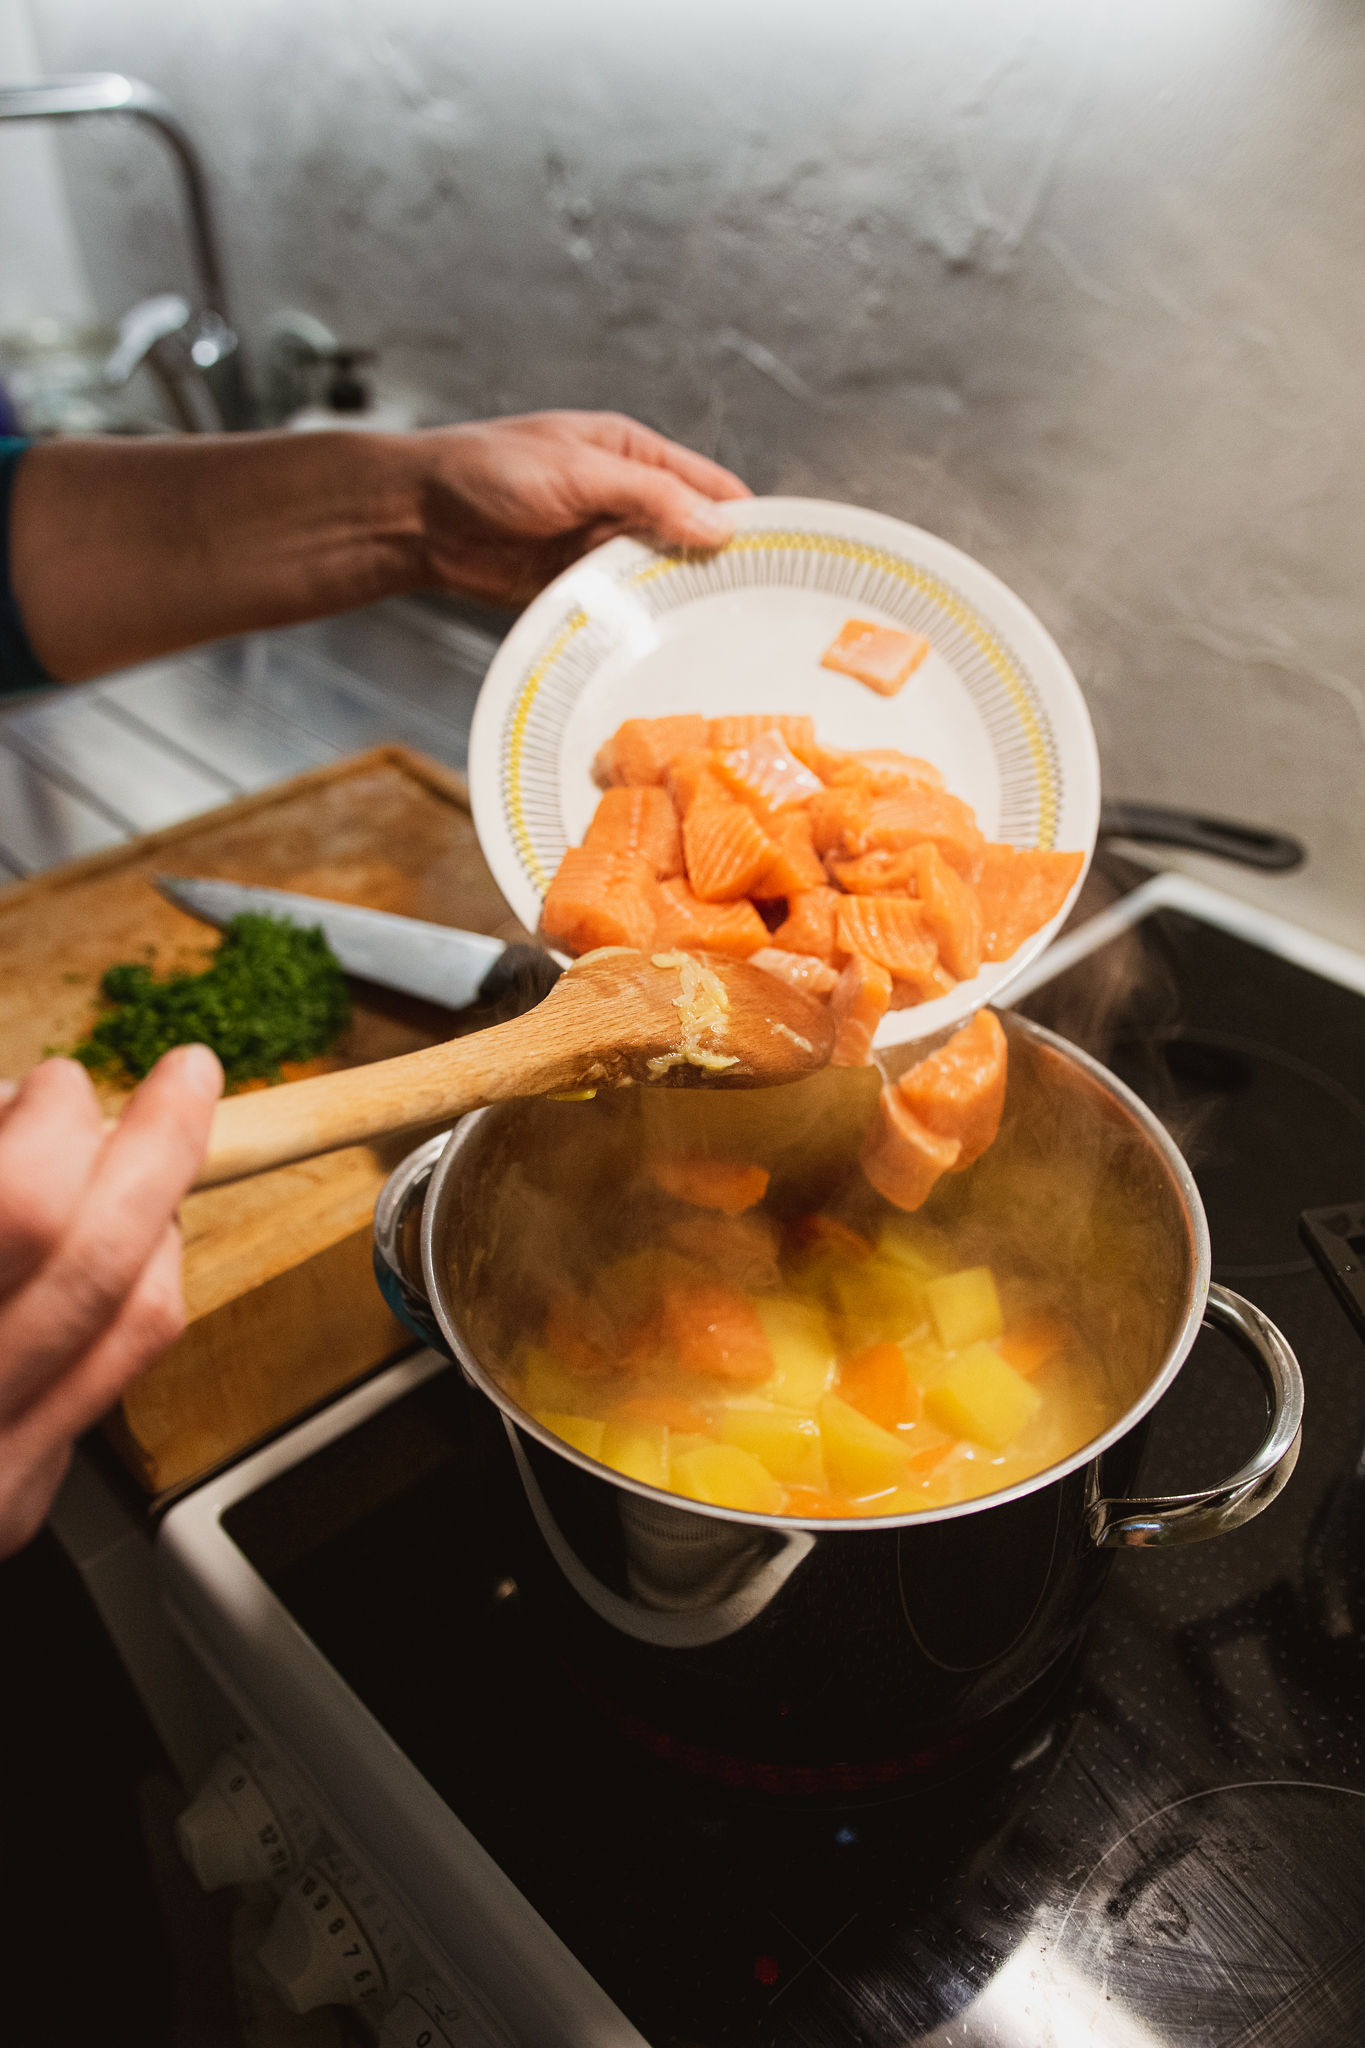 Adding salmon to traditional salmon soup recipe